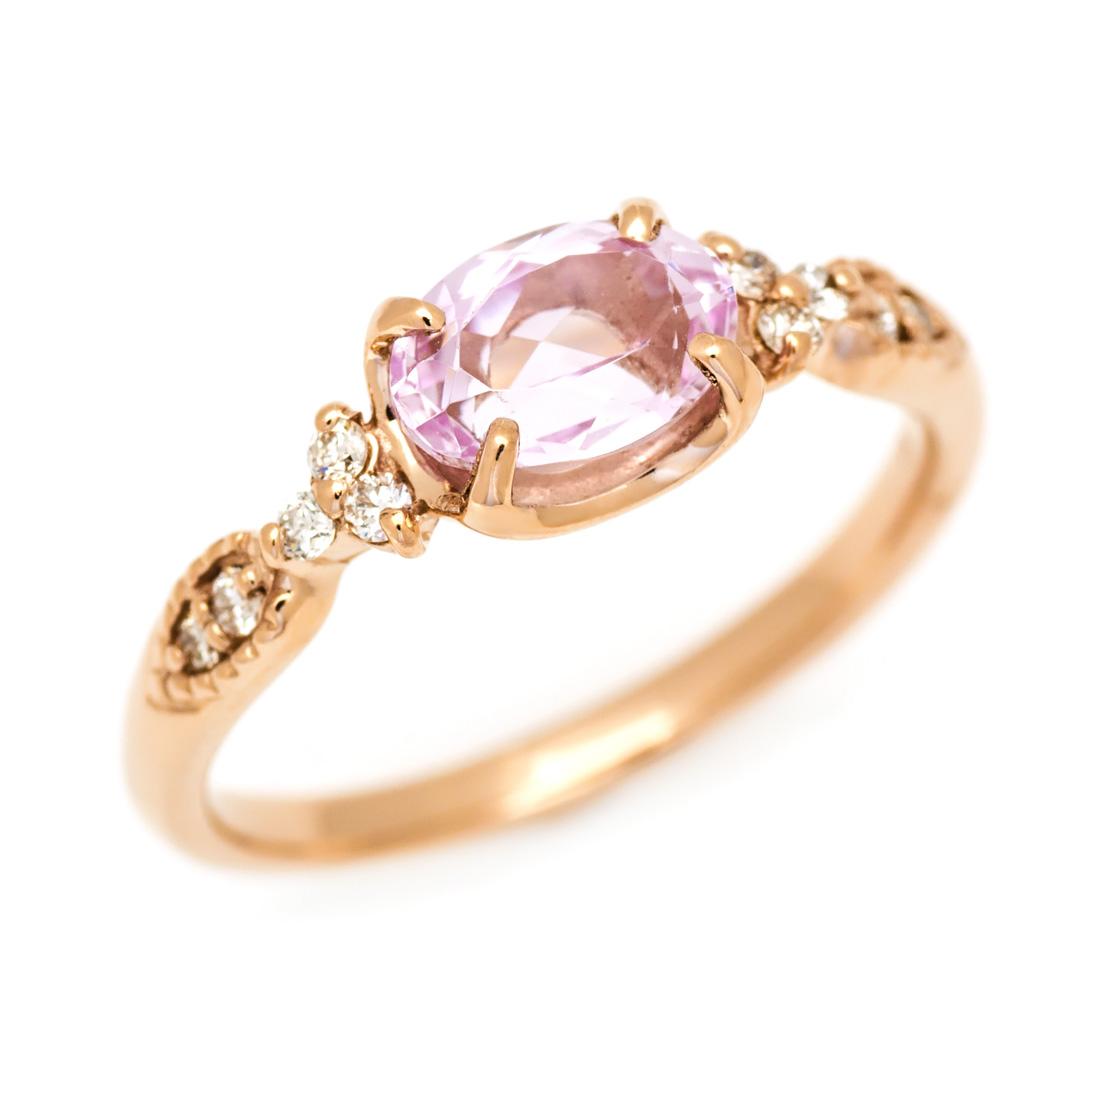 【GWクーポン配布中】リング クンツァイト ダイヤモンド 「amanza」 ゴールド K18 送料無料